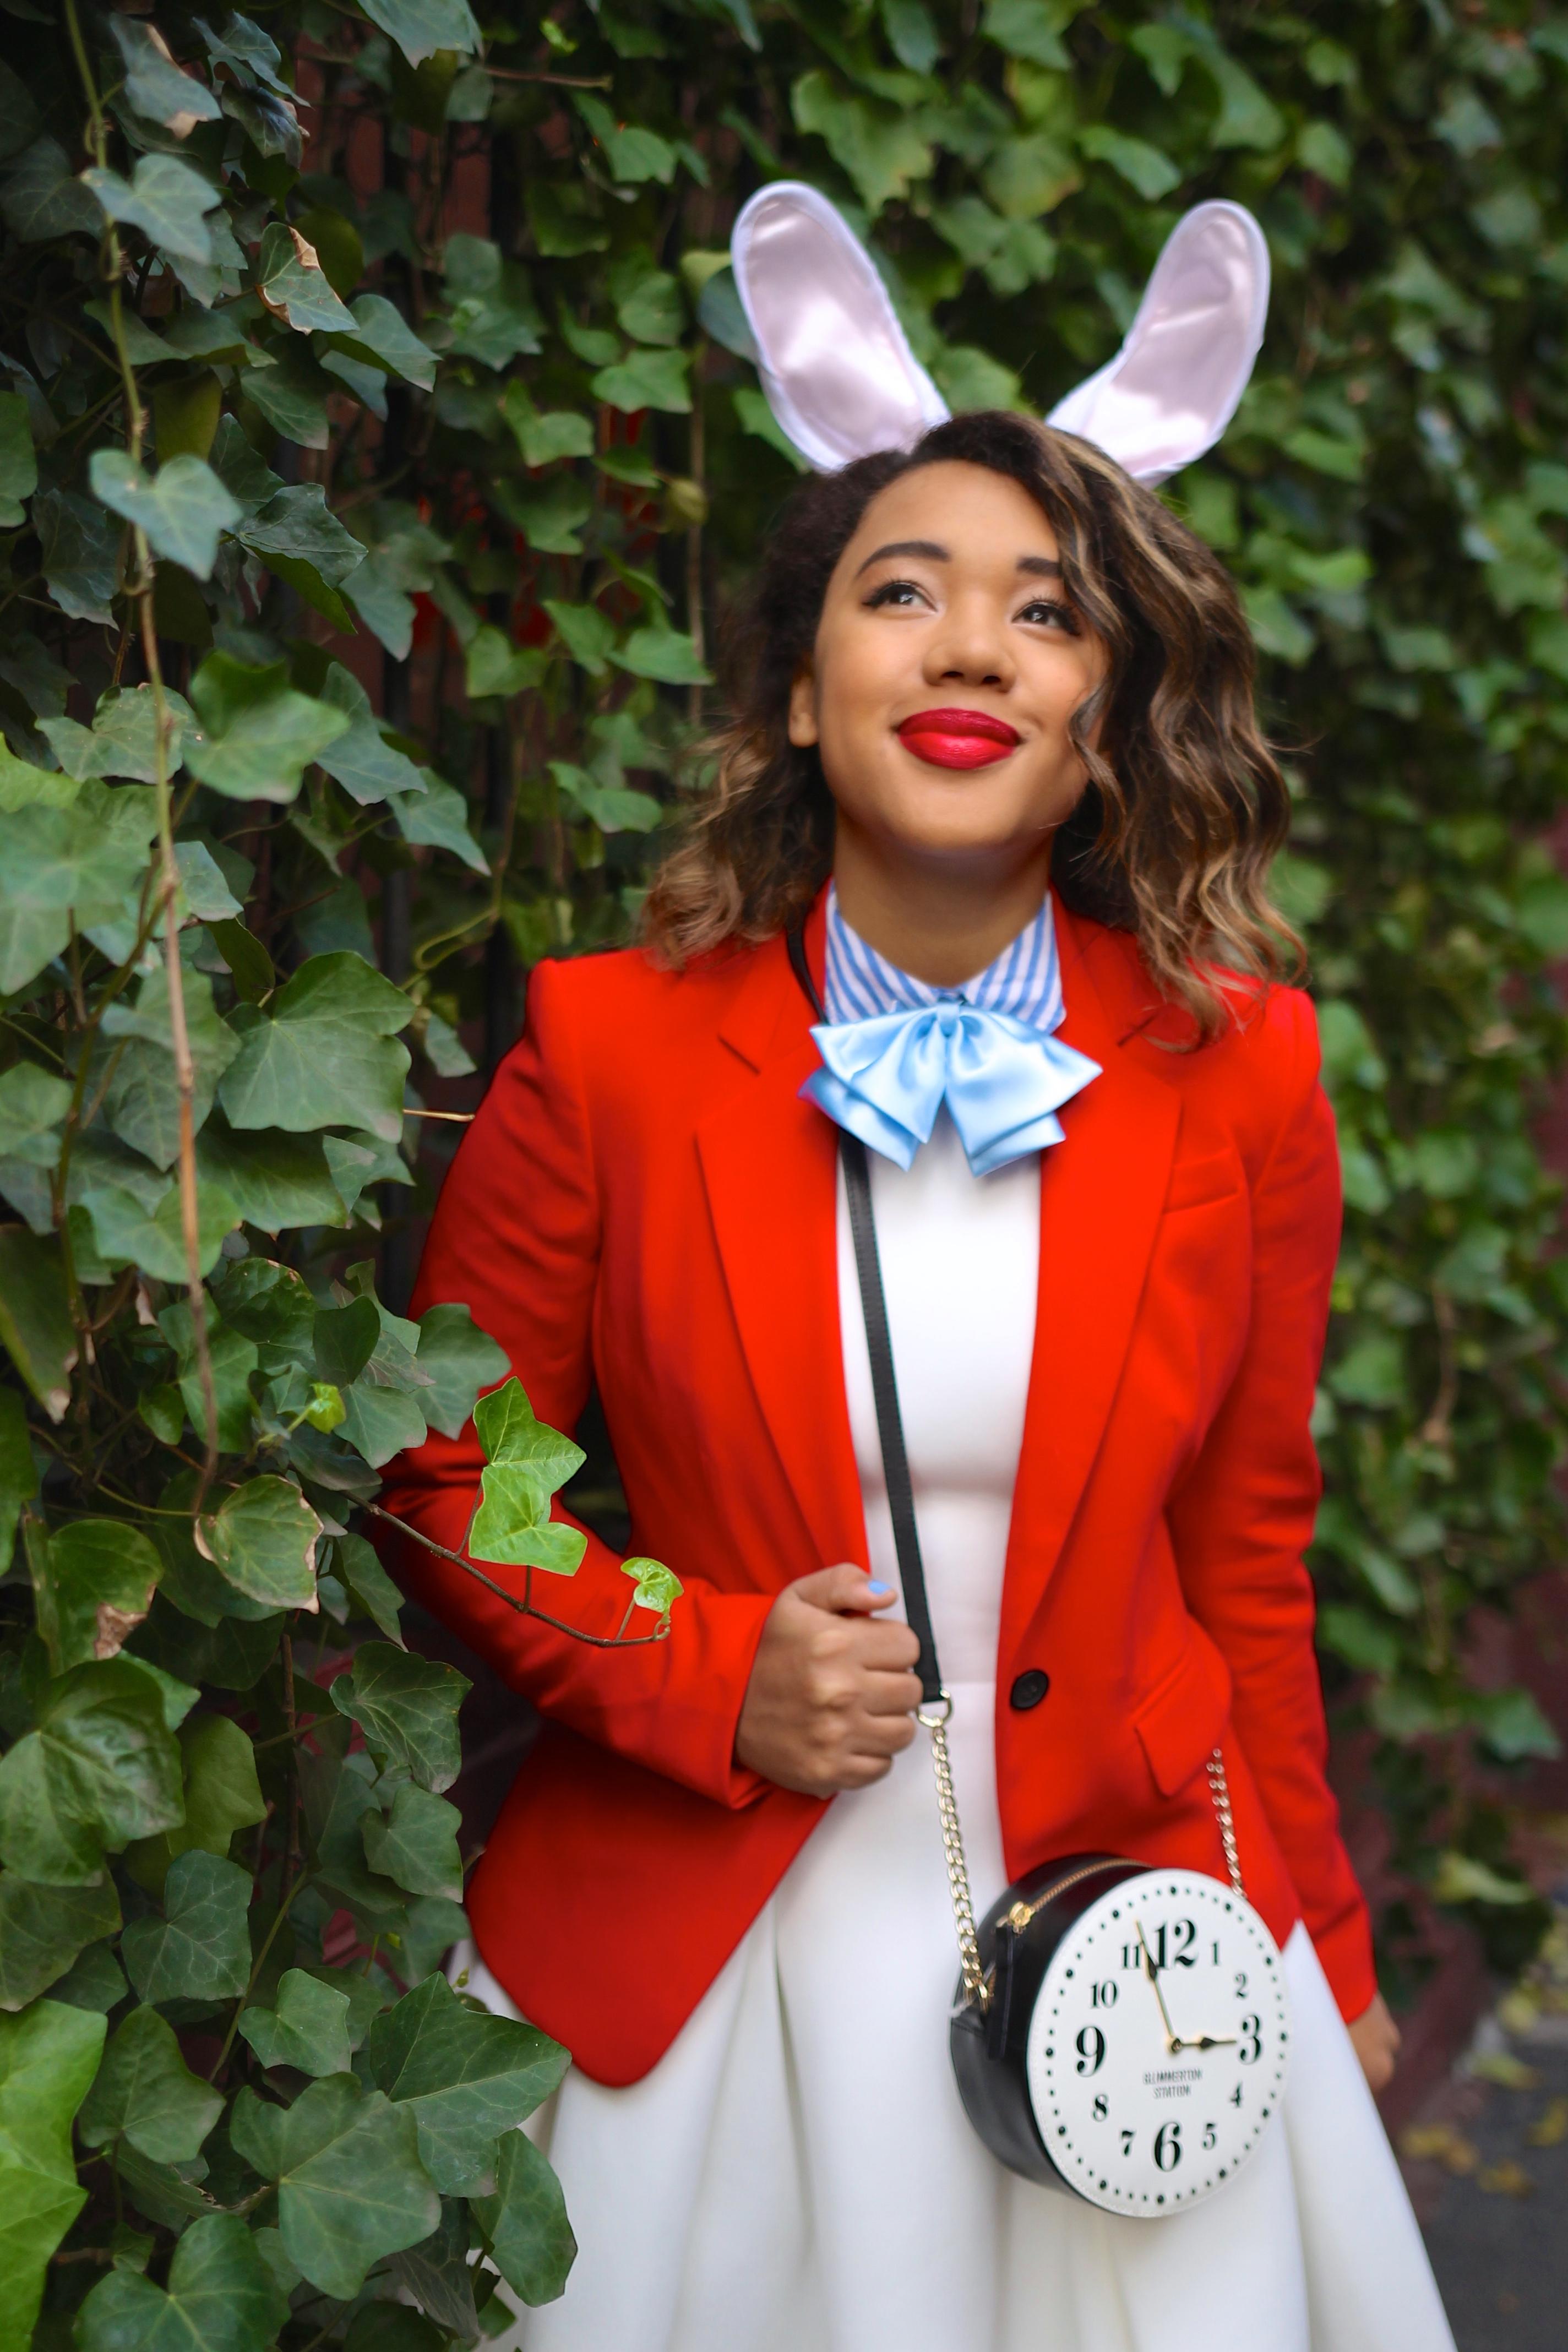 Color Me Courtney - DISNEY DIY – 2 Easy Halloween Costumes